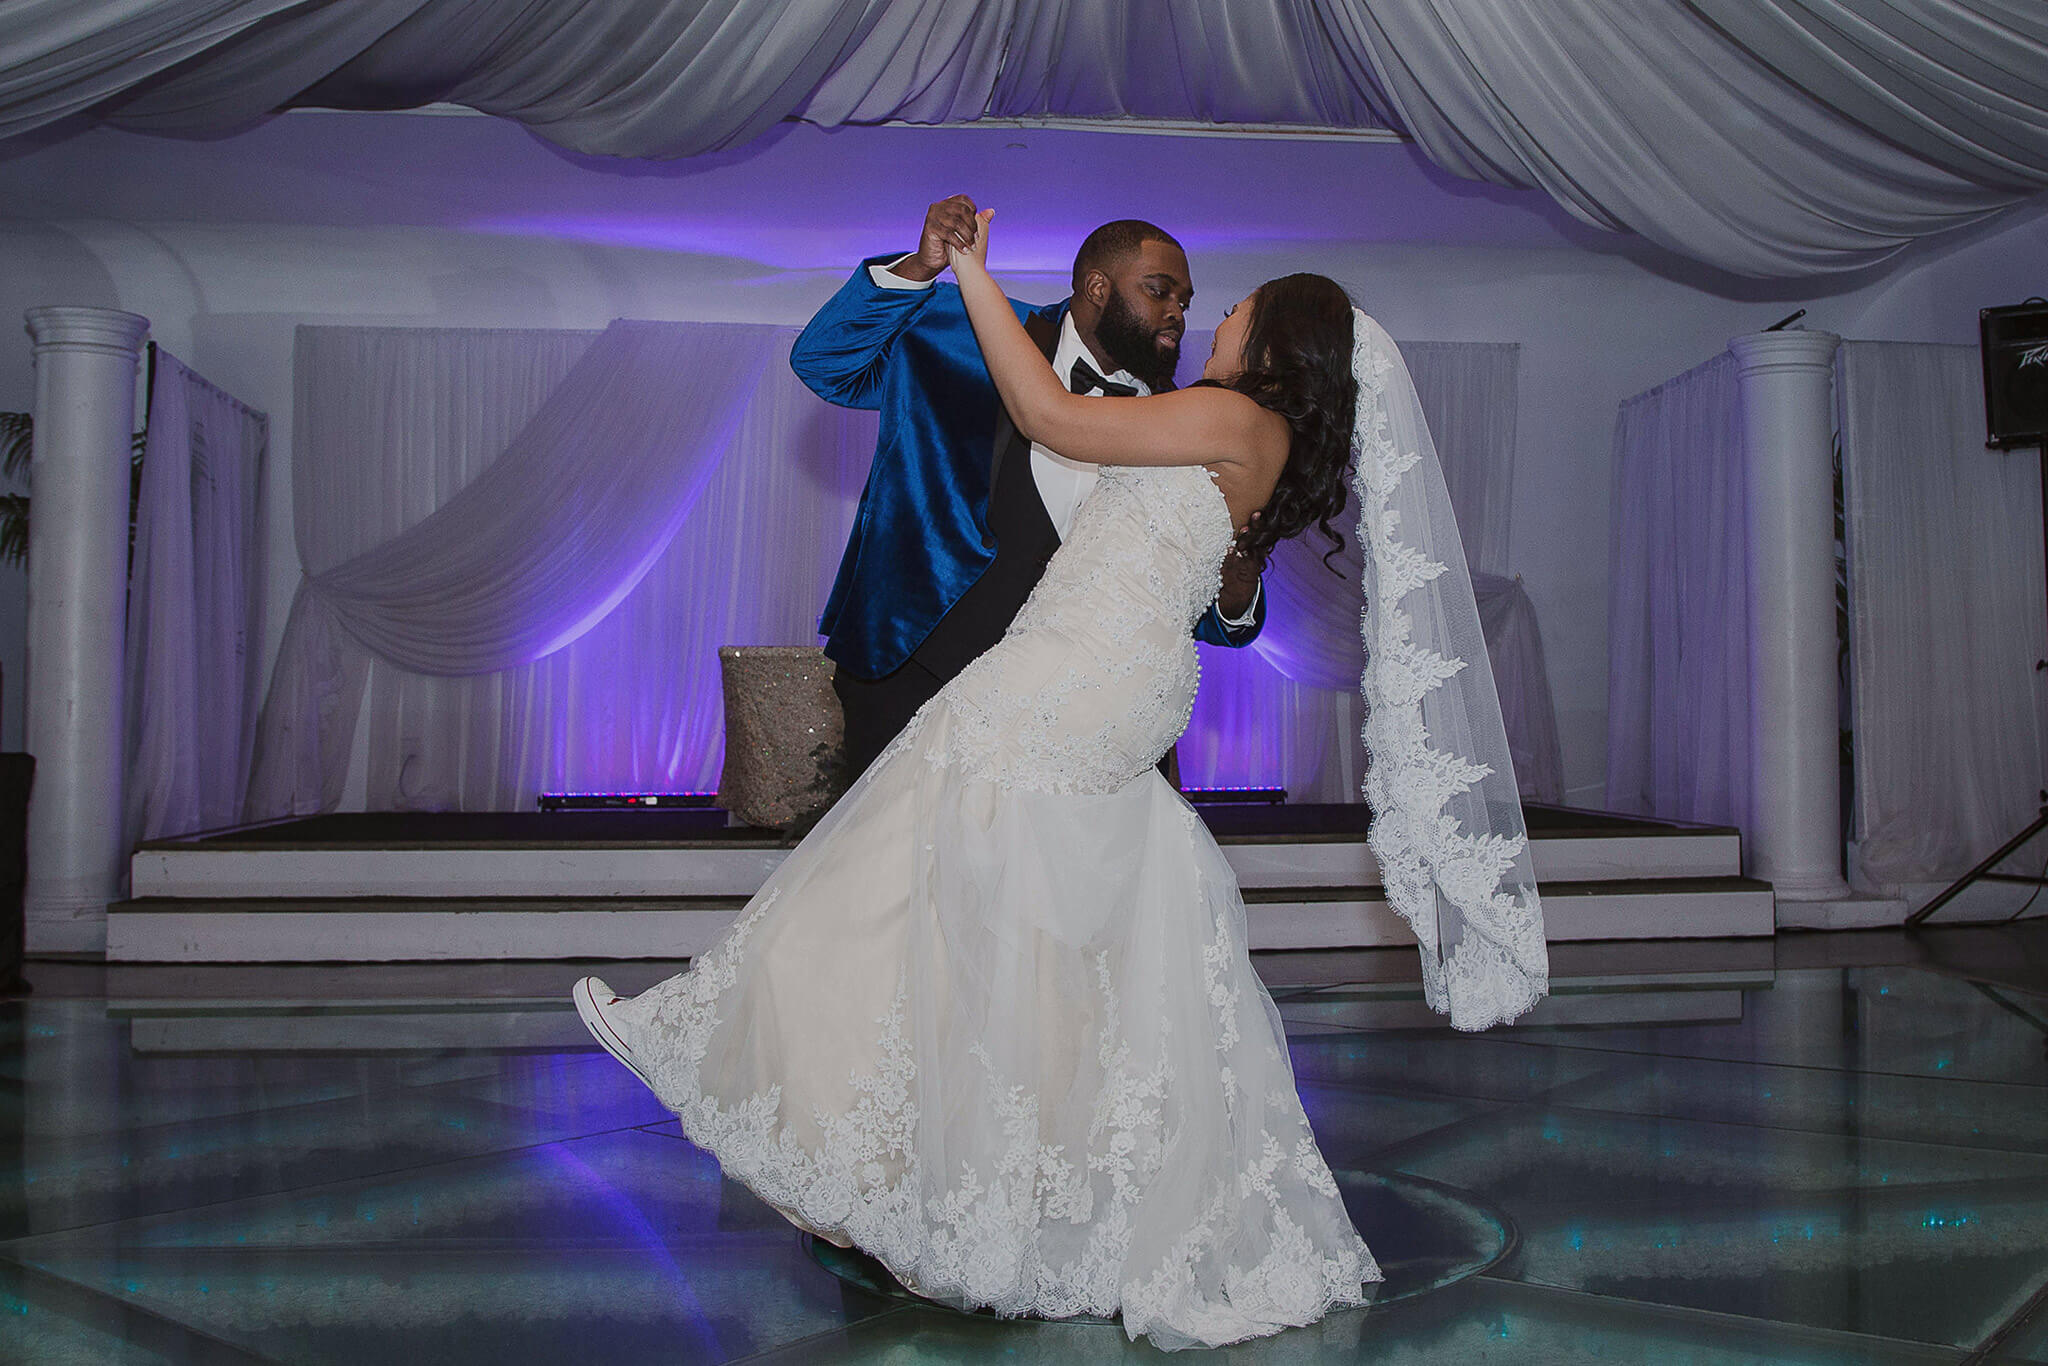 Husband & Wife's First Dance, so sweet!